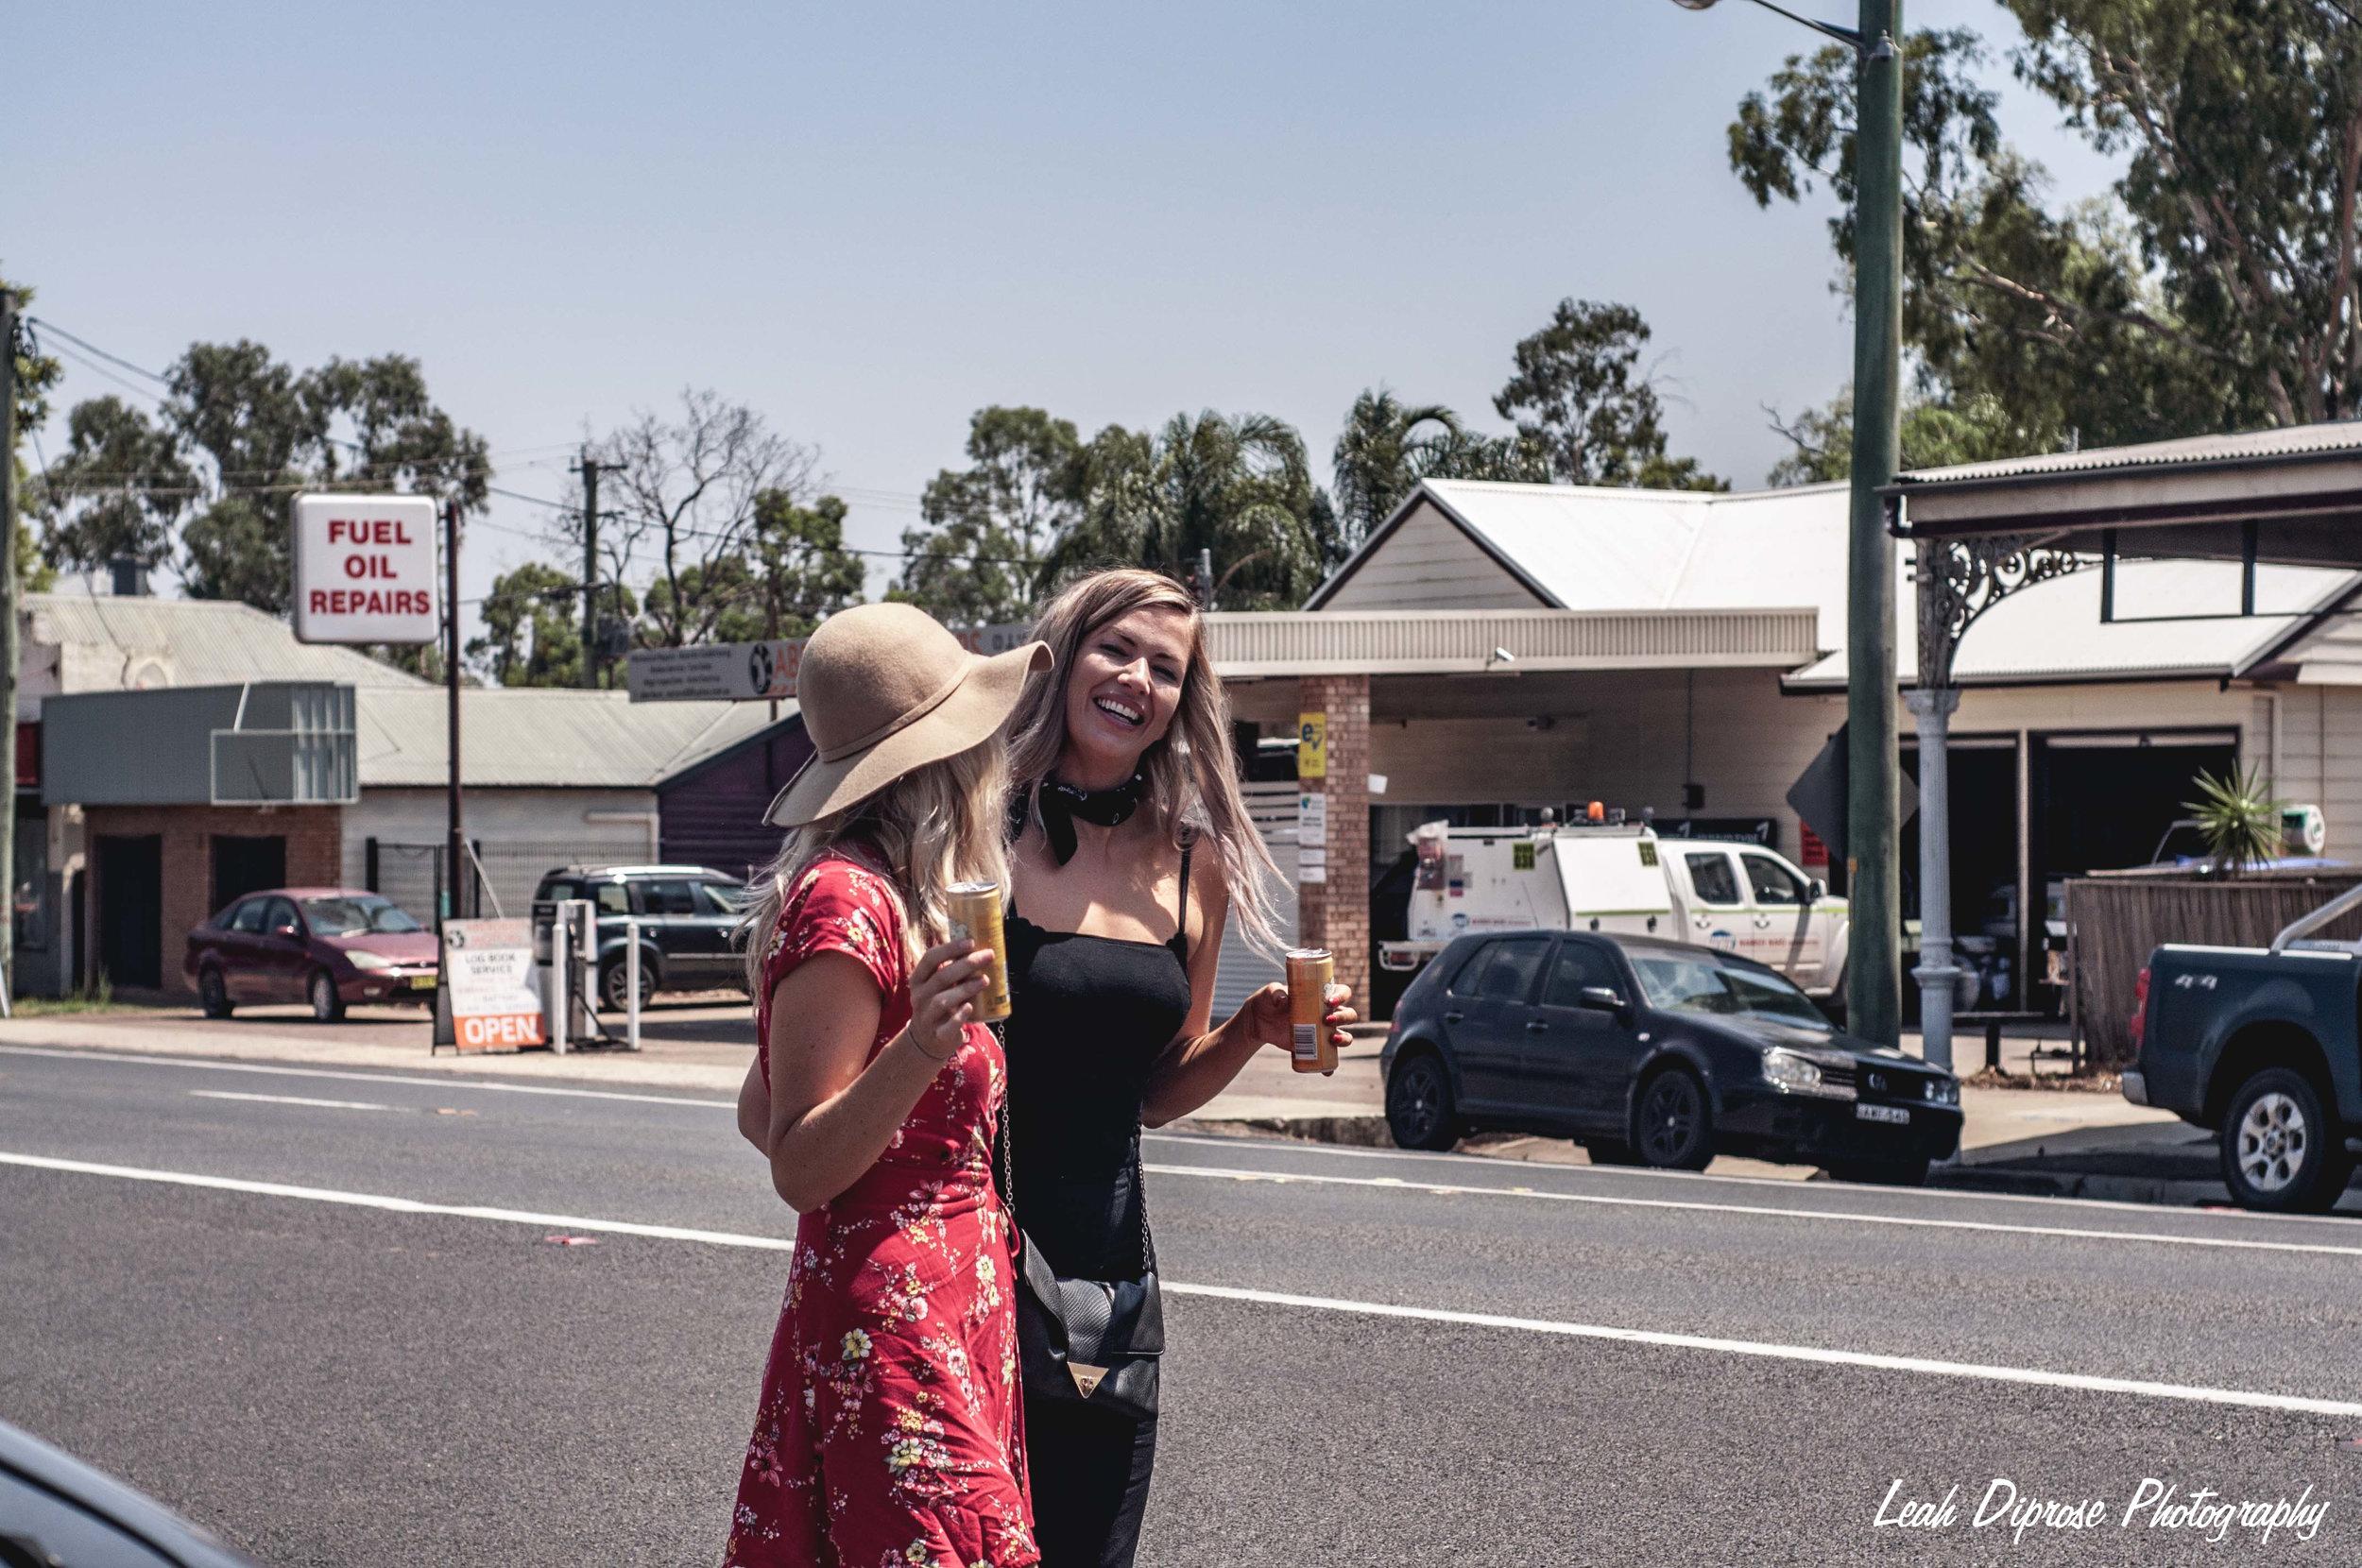 Leah Diprose Photography image-6231.jpg